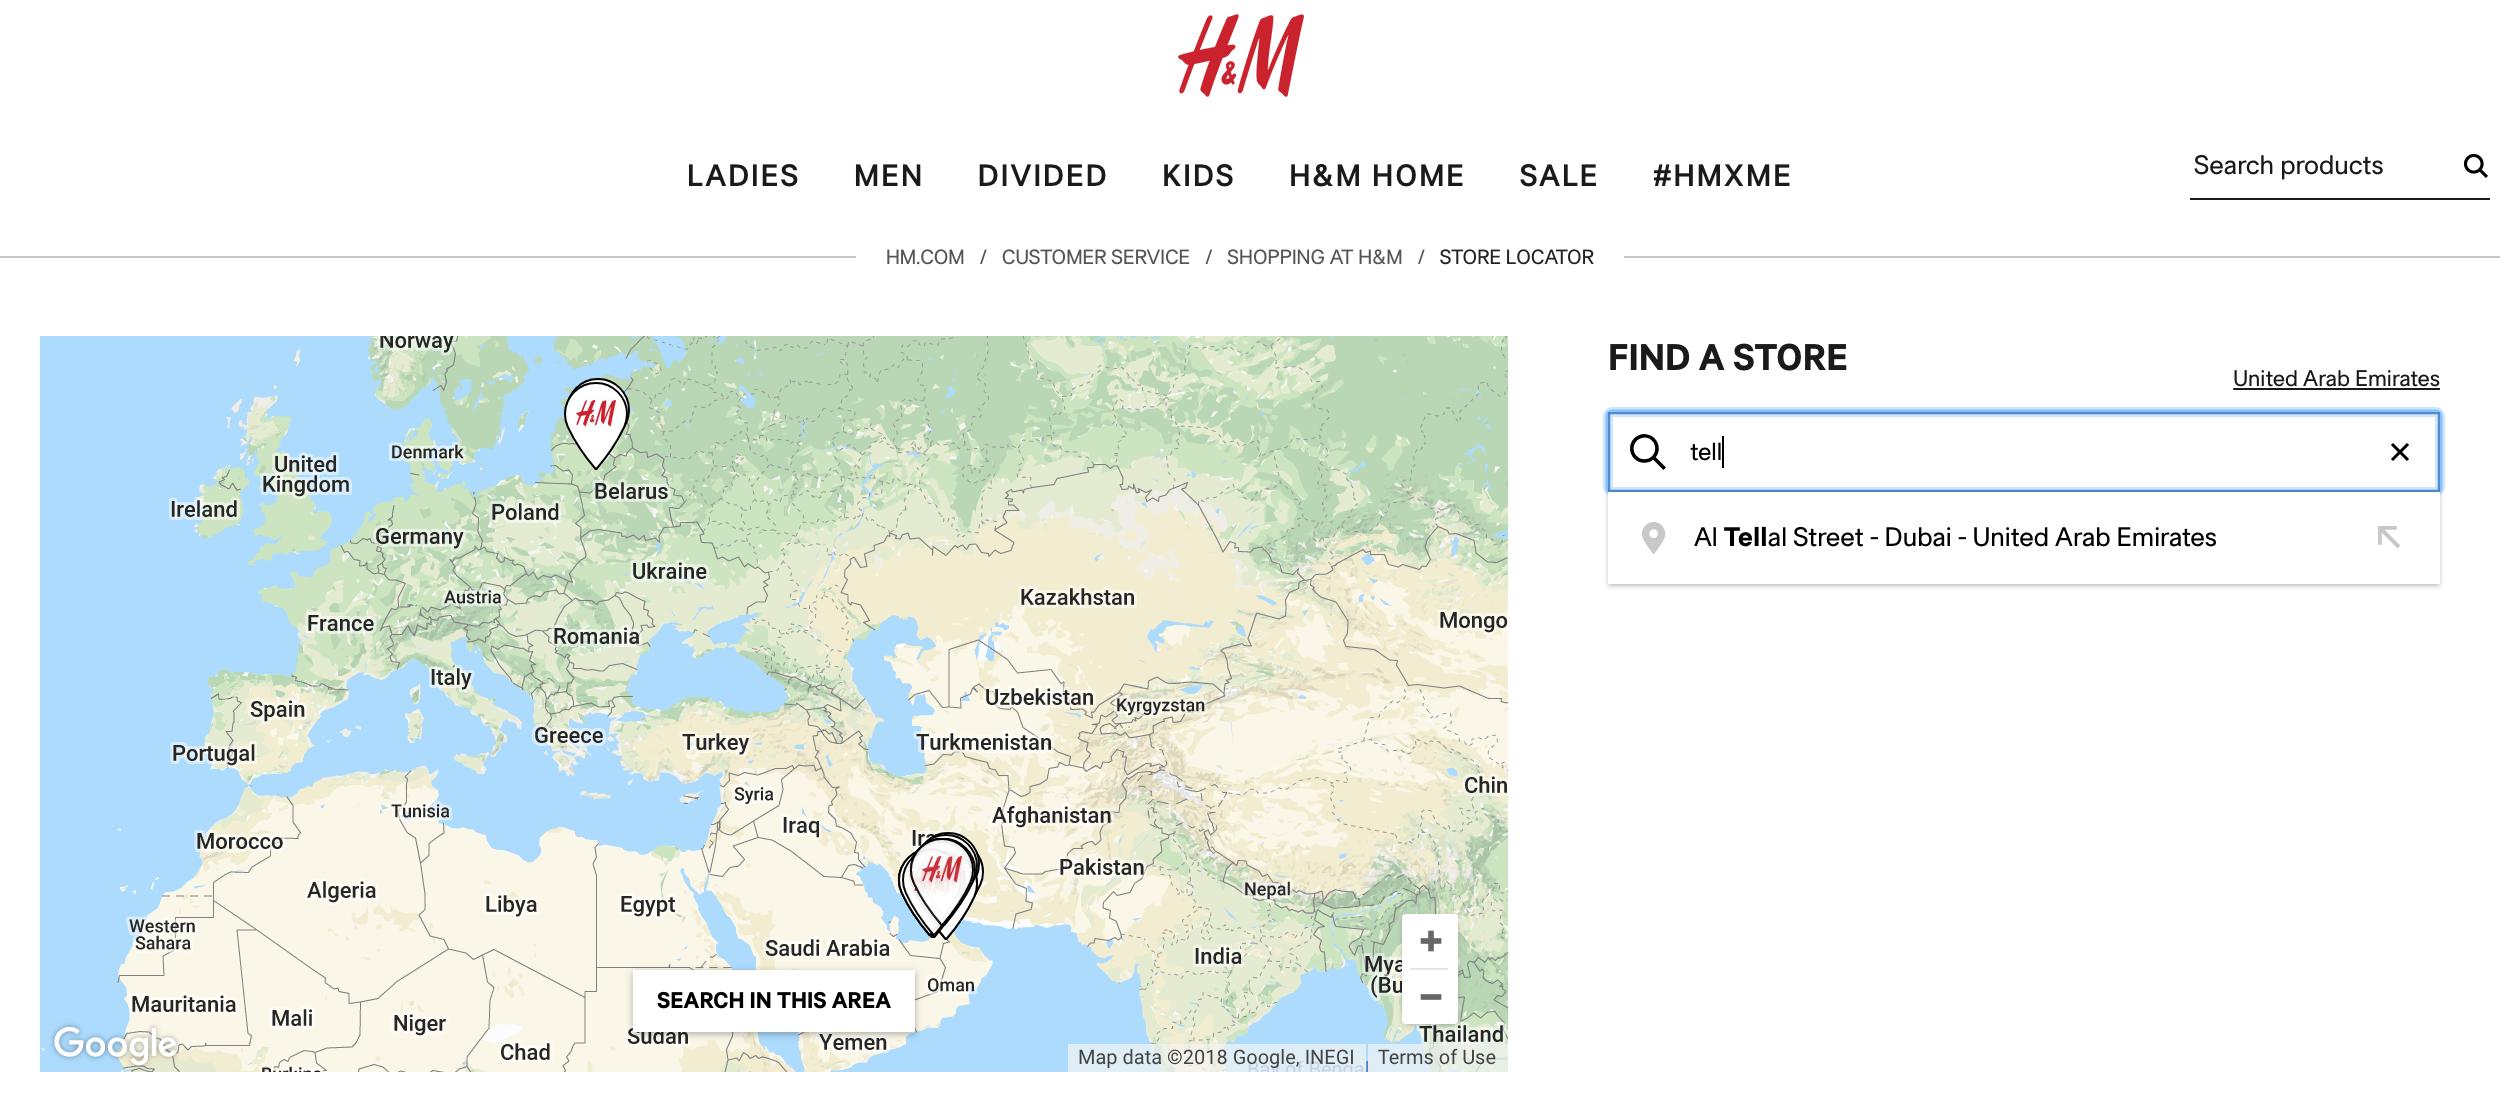 store-finder-best-practices-h&m